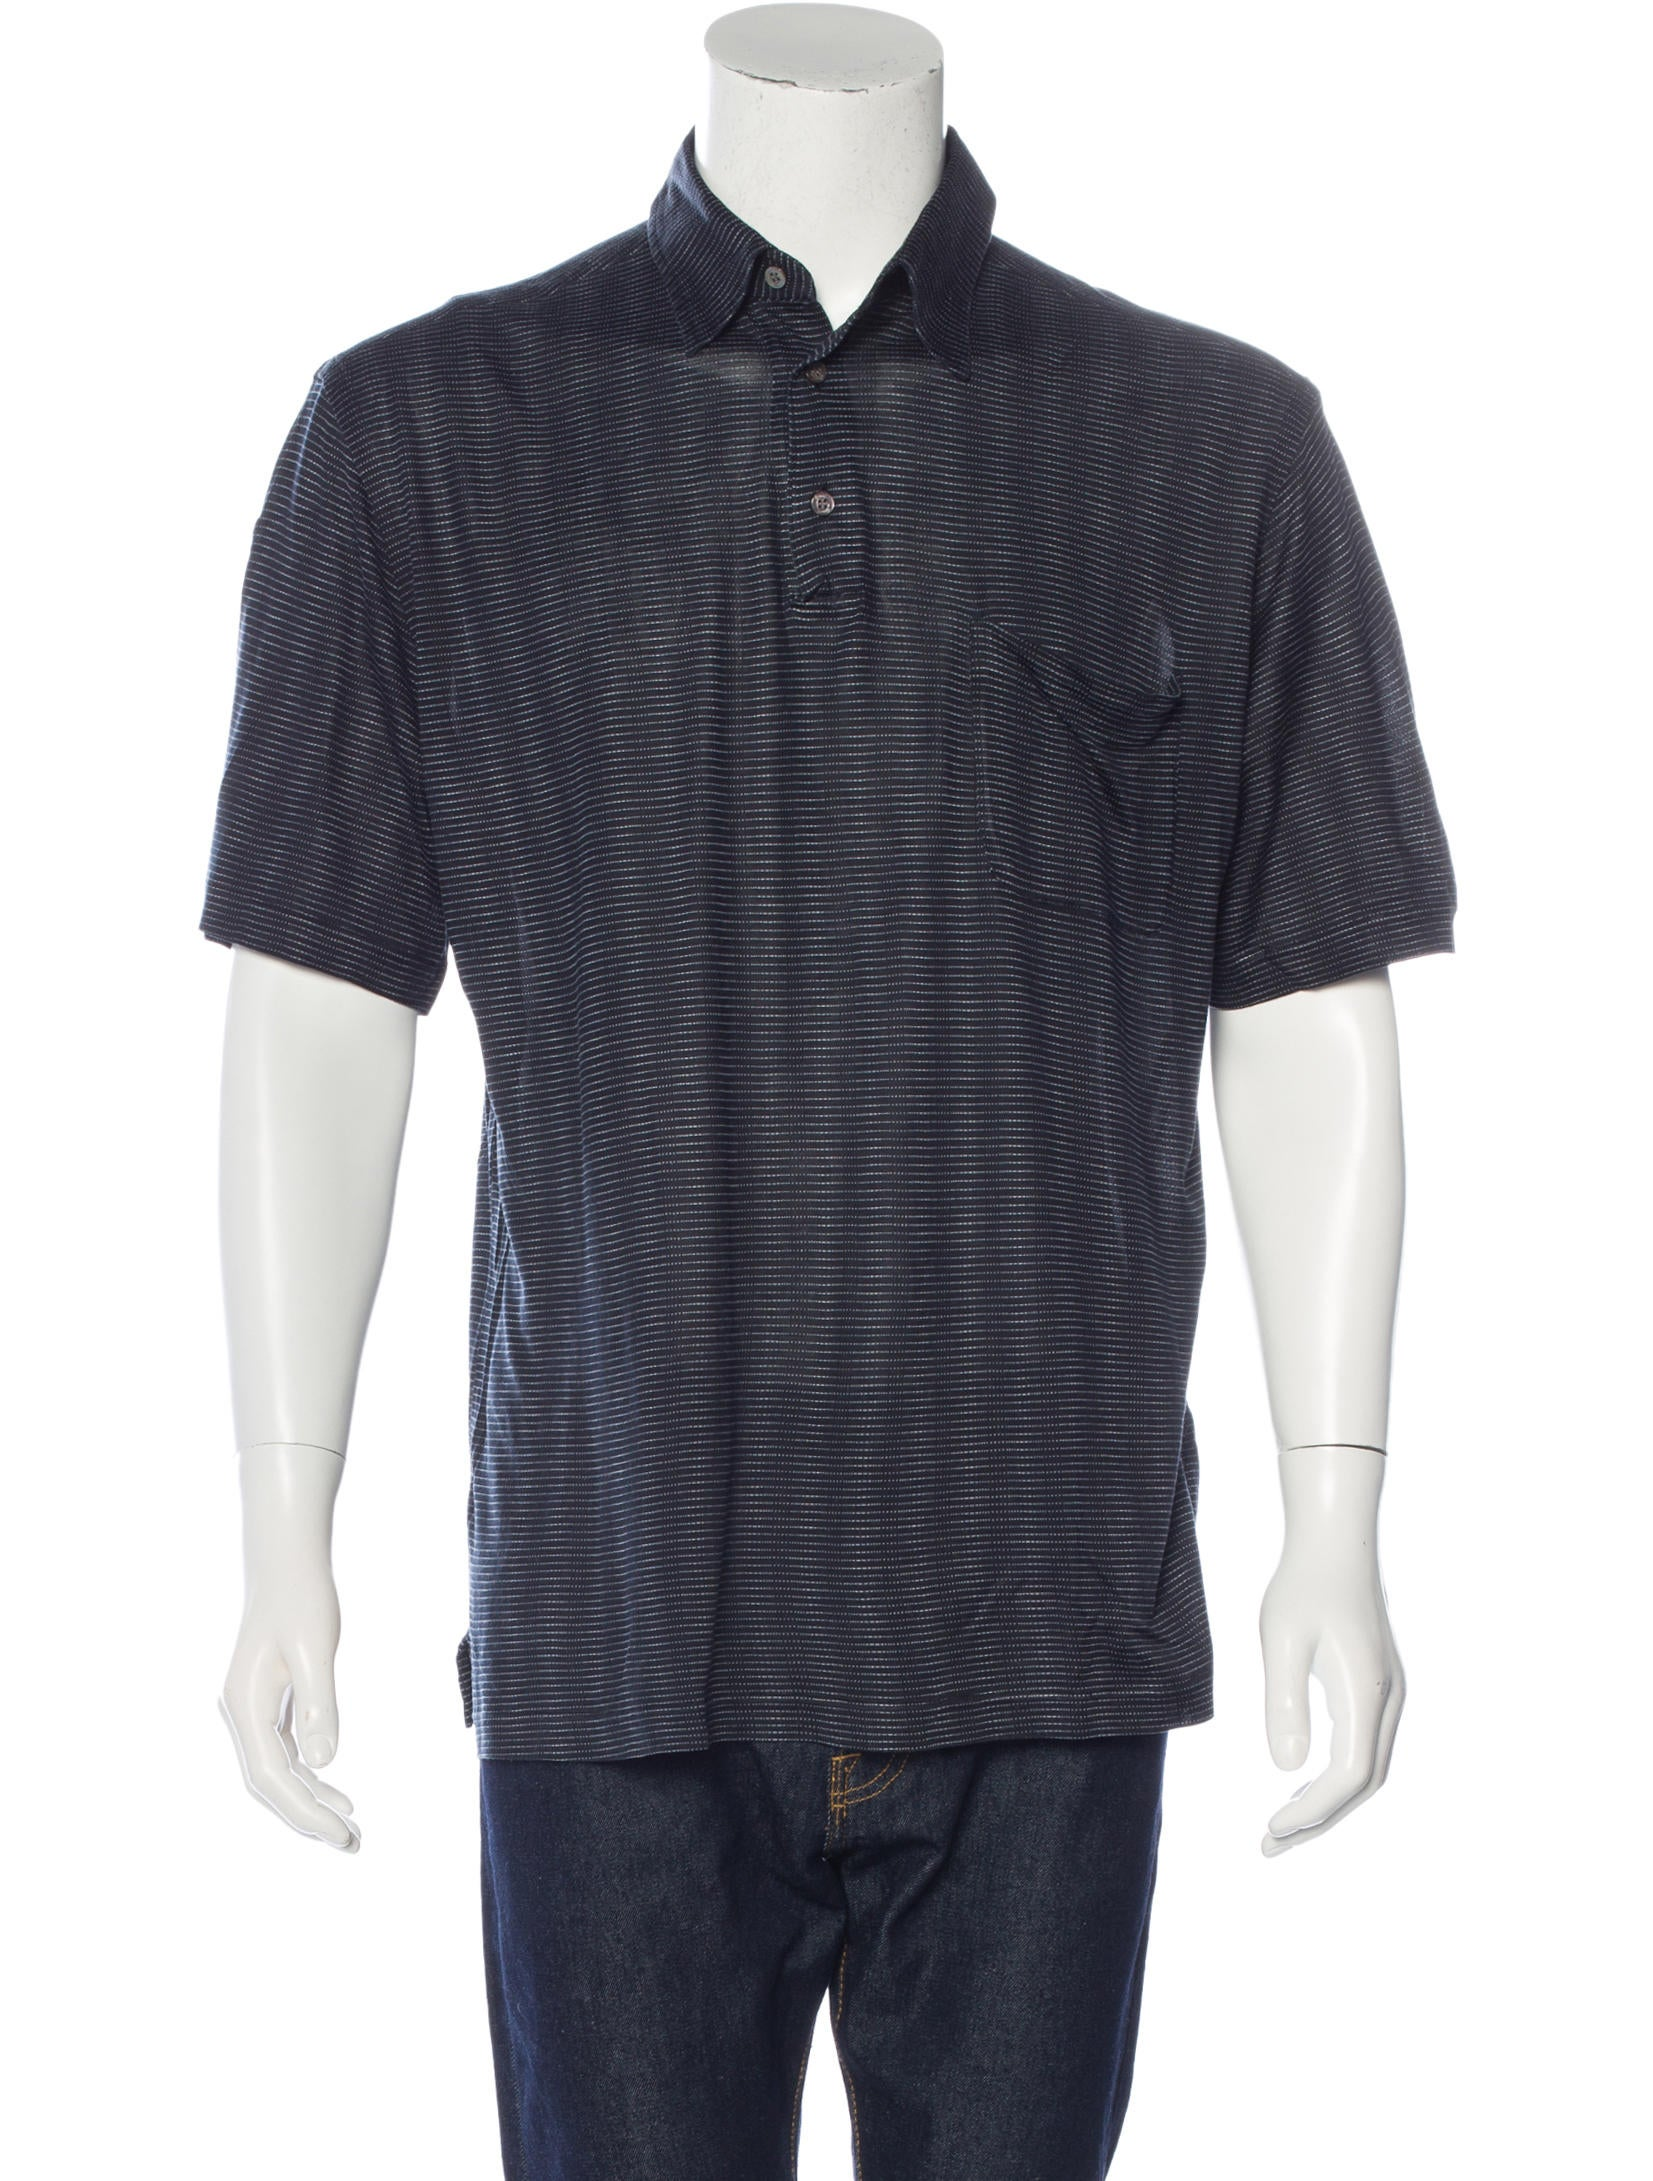 Brioni Silk Striped Polo Shirt Clothing Bro21457 The